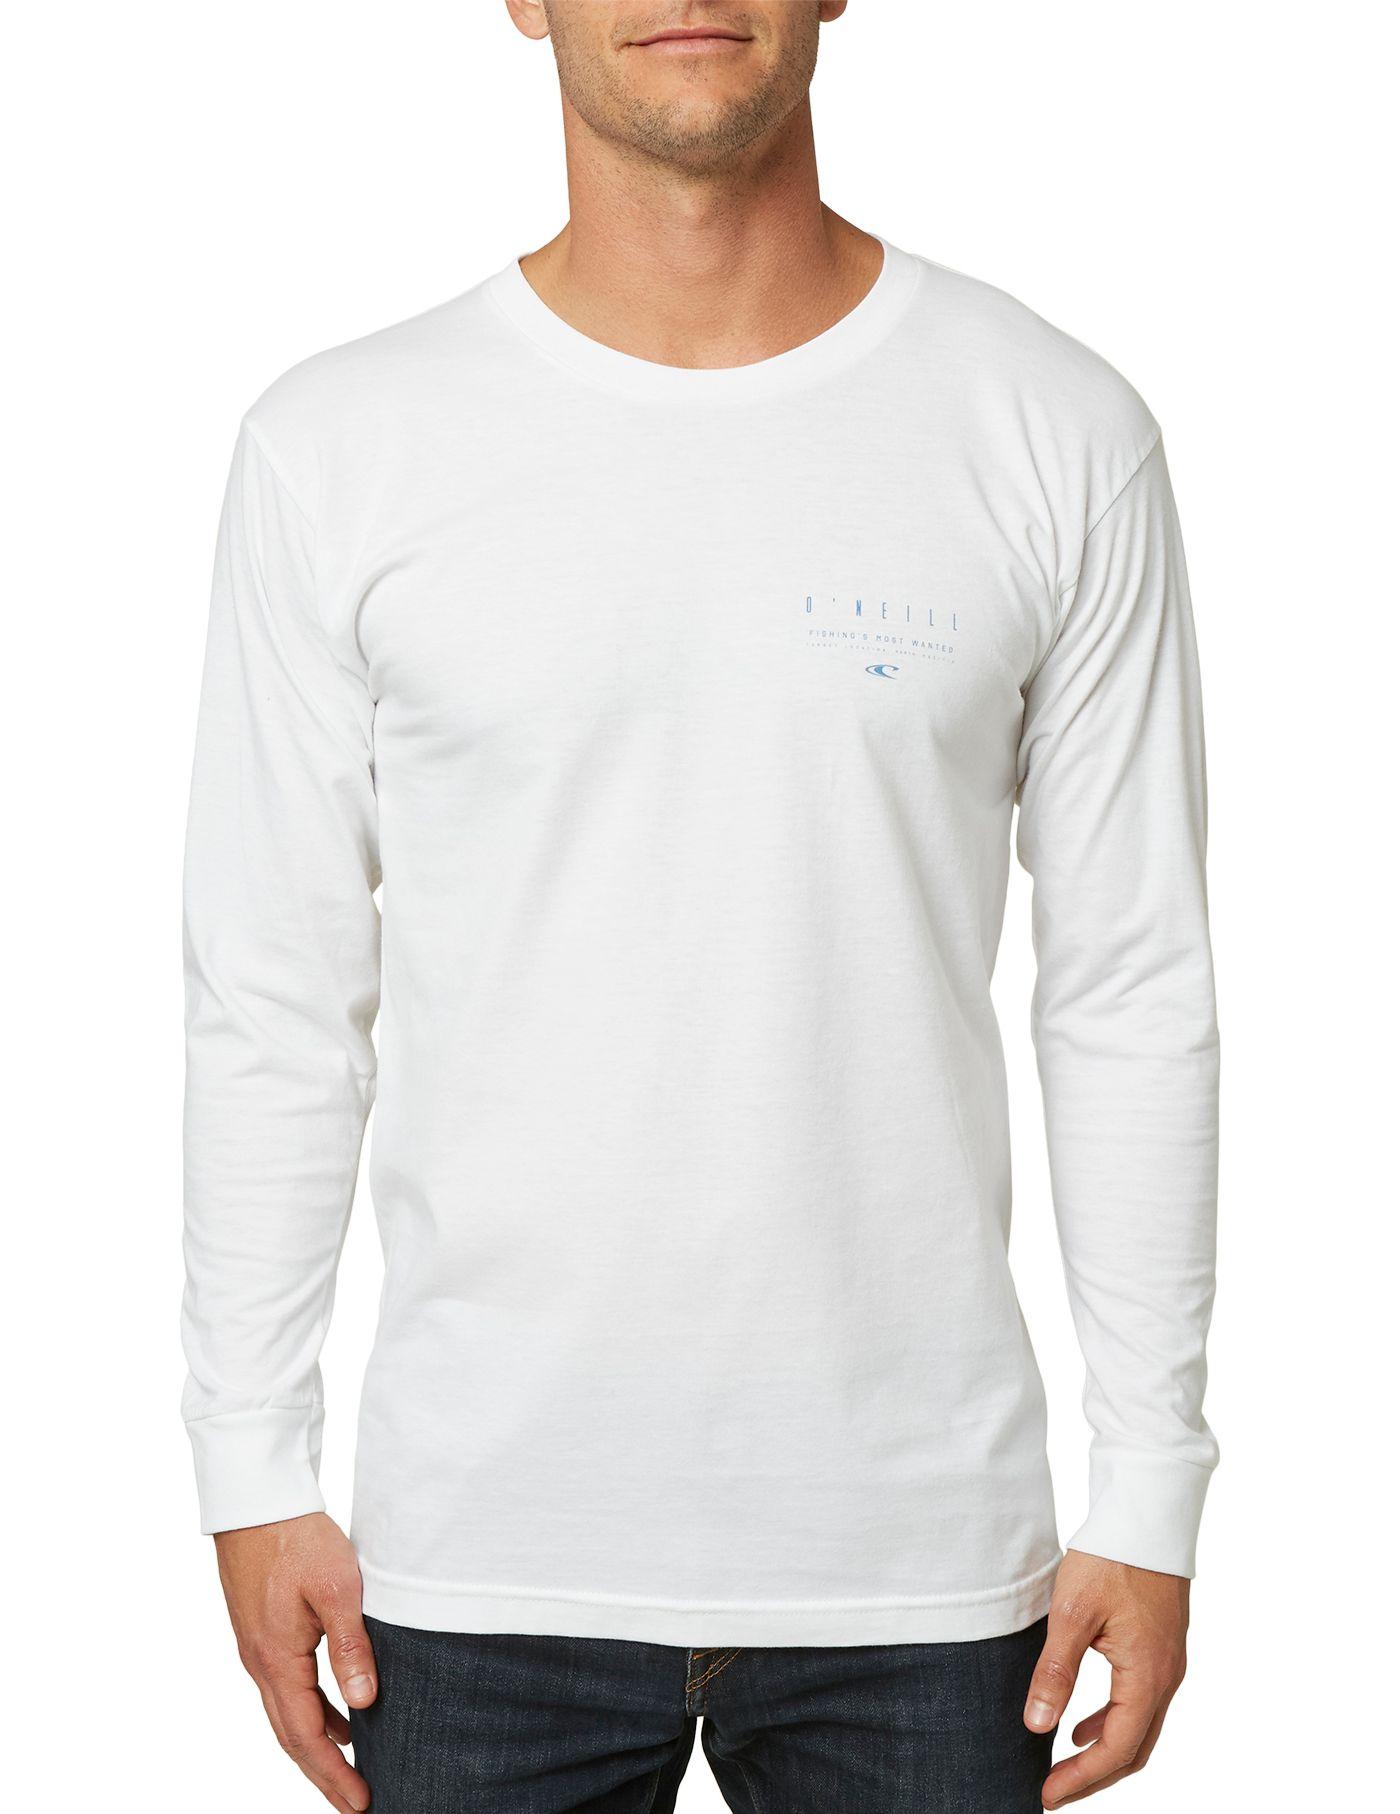 O'Neill Men's Most Wanted Long Sleeve T-Shirt